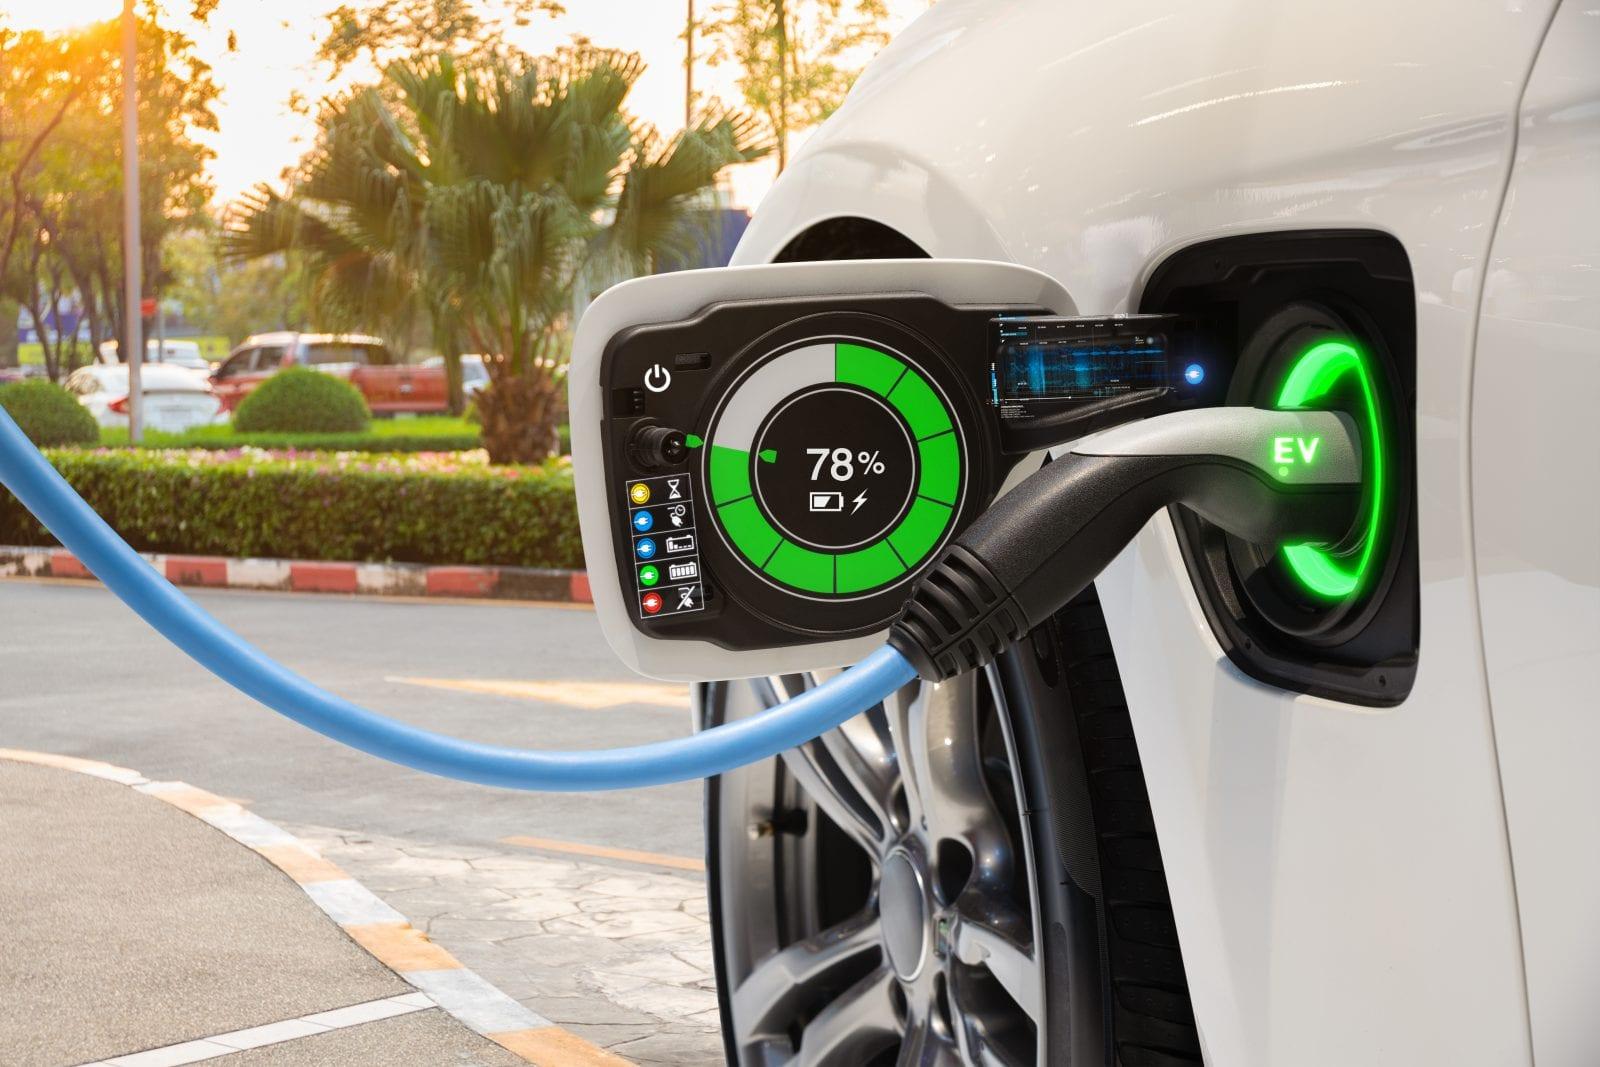 Eco Friendly Car charging